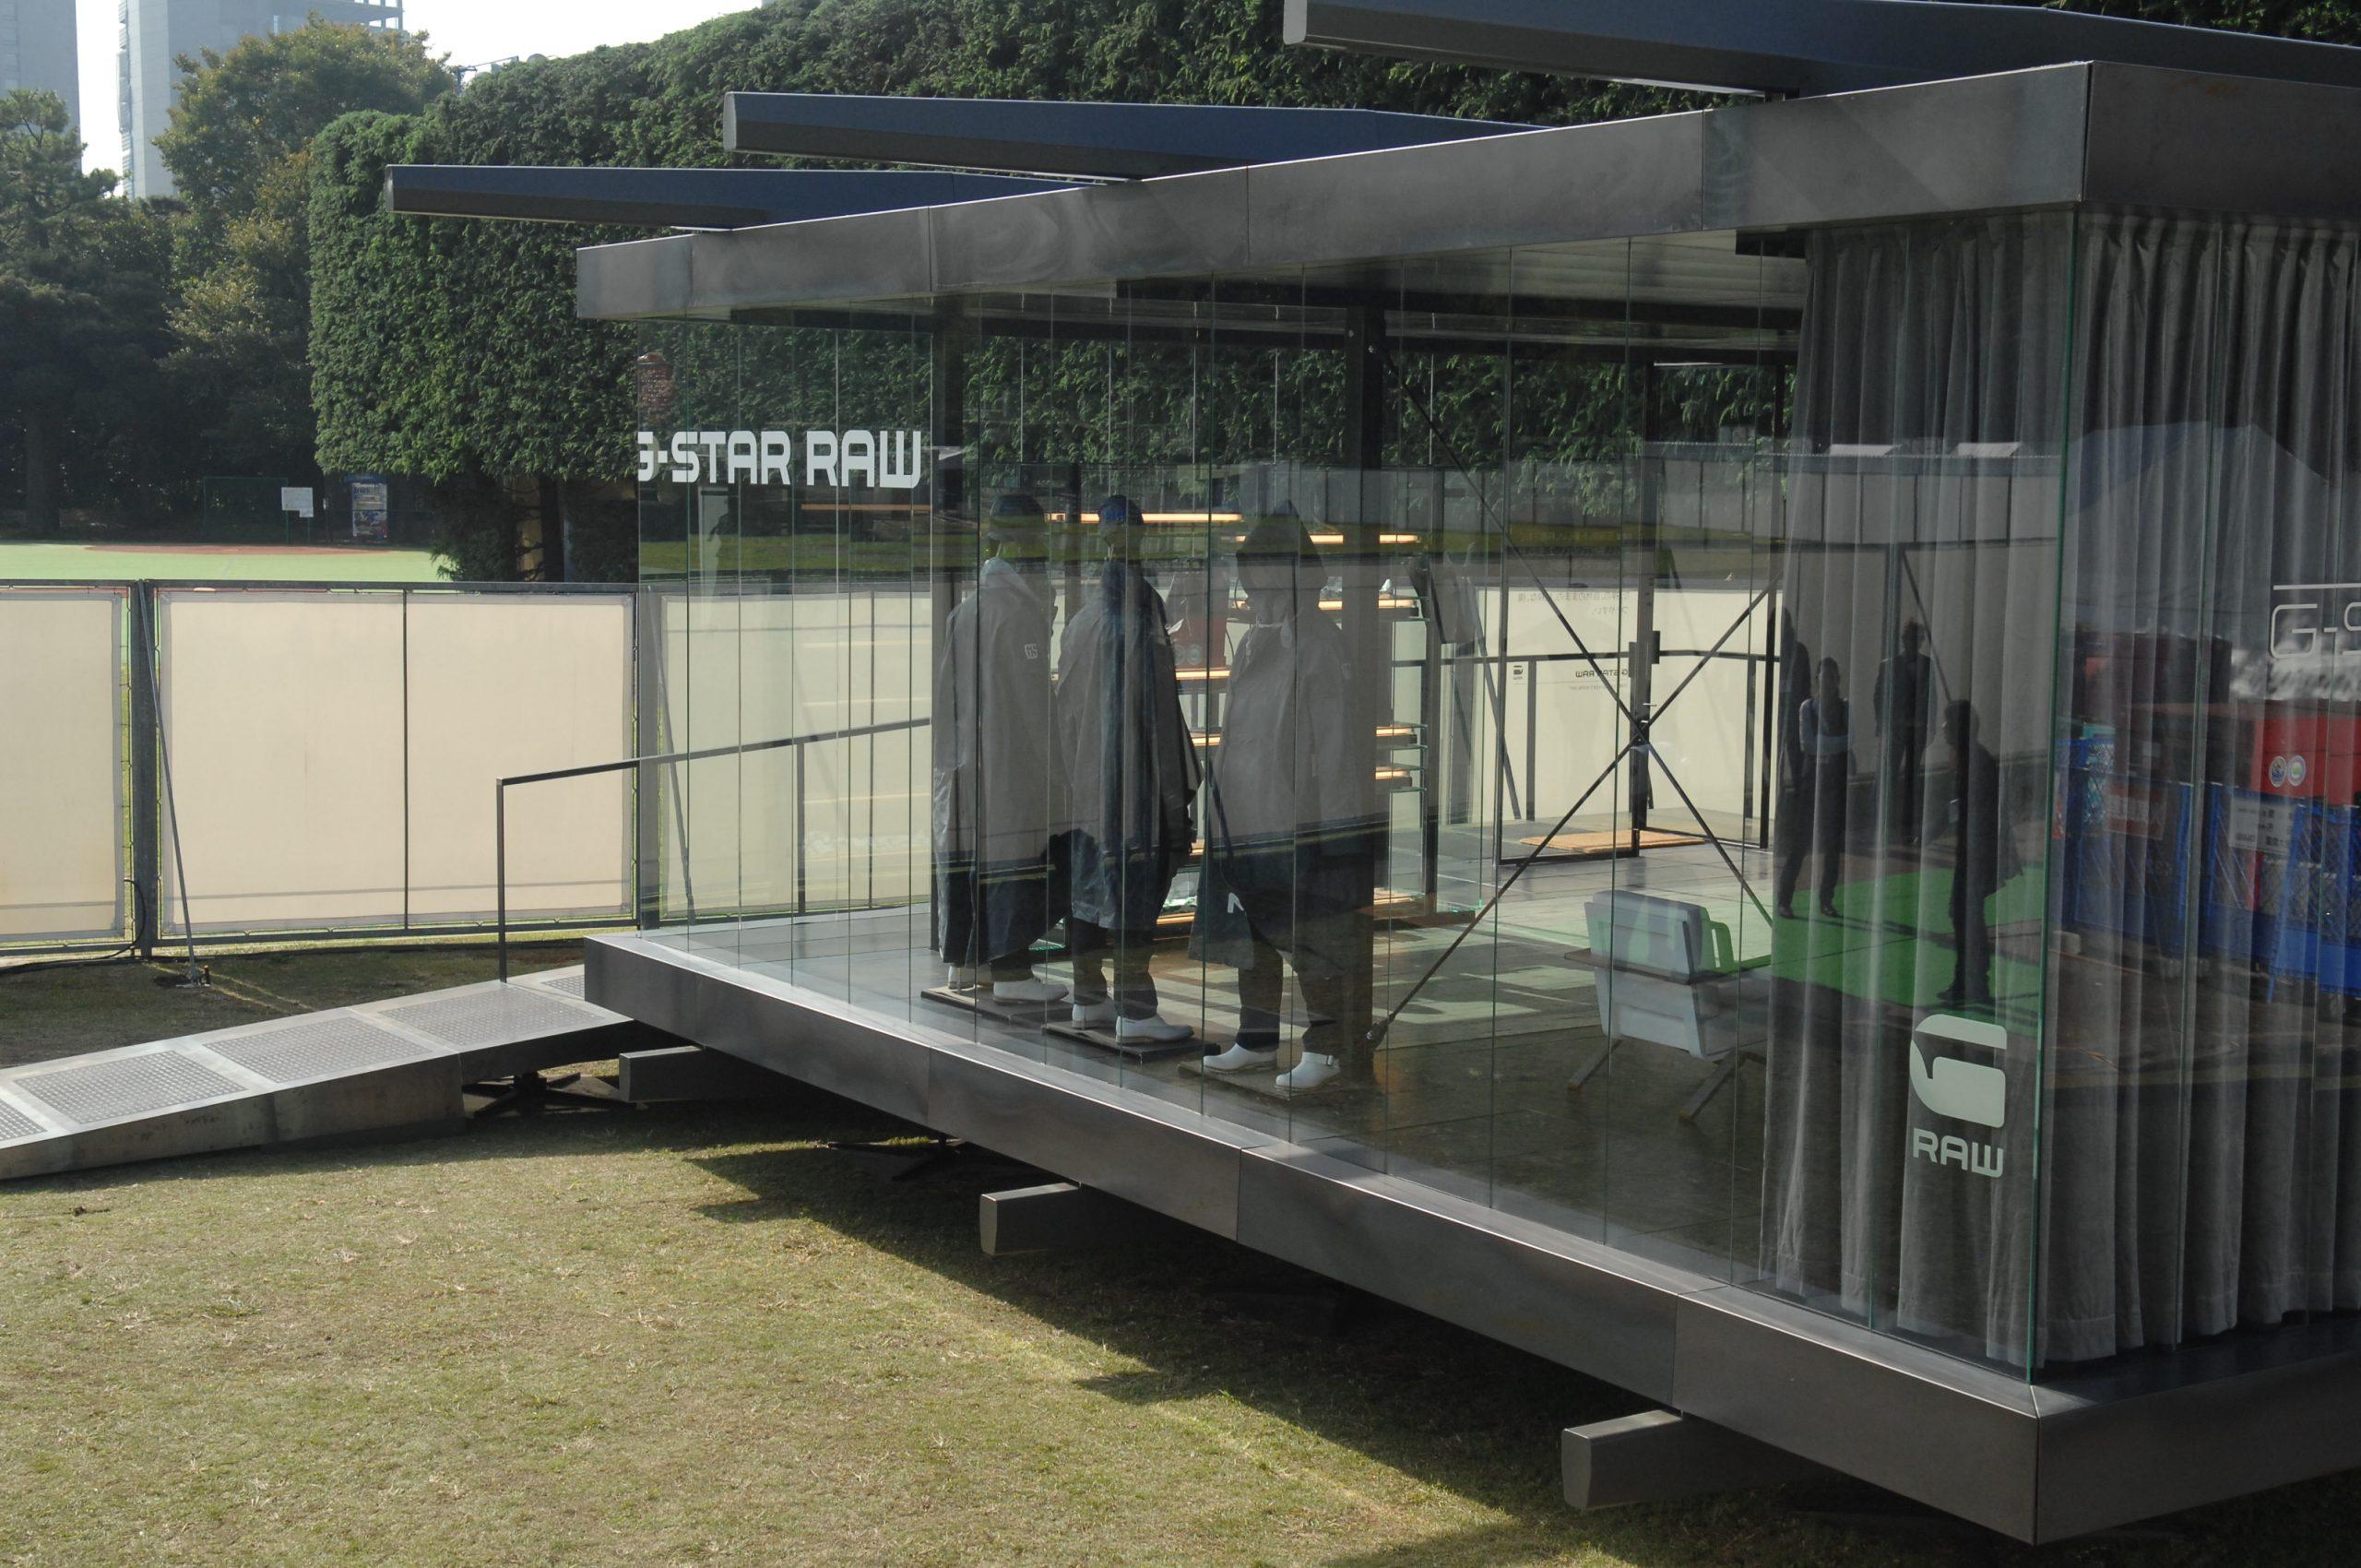 G-star pavilion Florence Tokyo Berlin